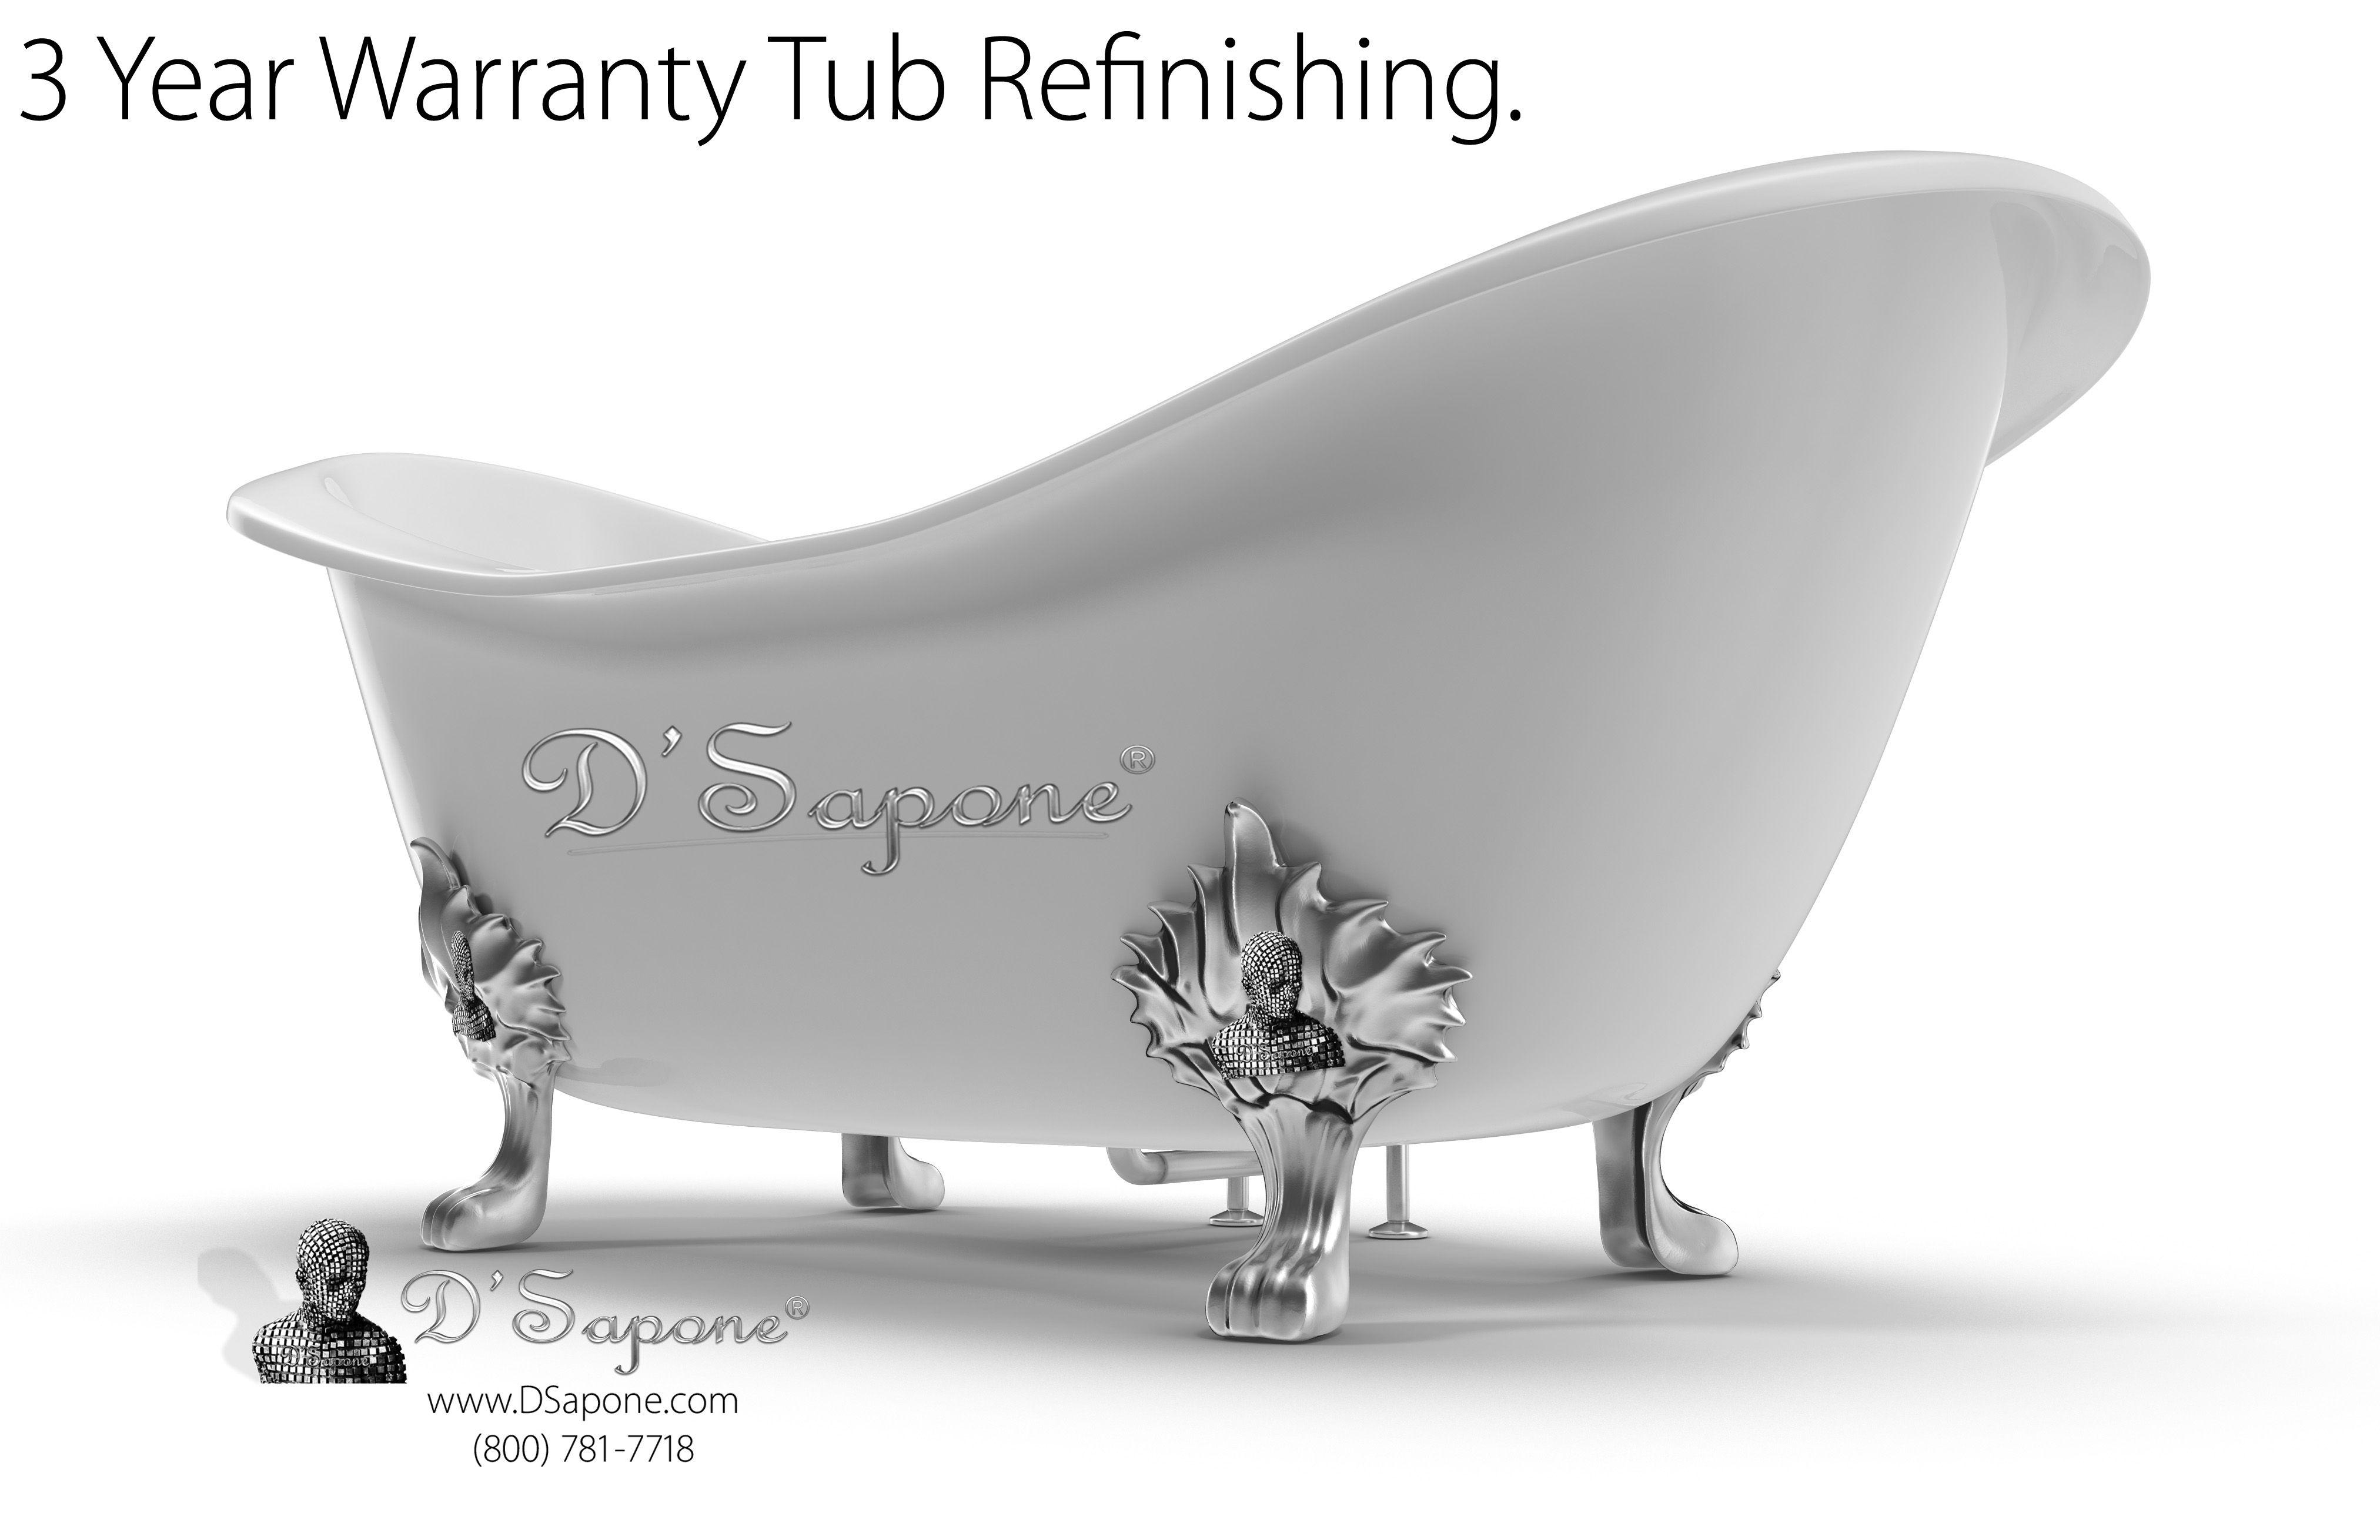 Sapone Provides Bathtub Restoration And Refinishing Services In Atlanta,bathtub  Refinishing Services In Atlanta Georgia At Affordable Prices .